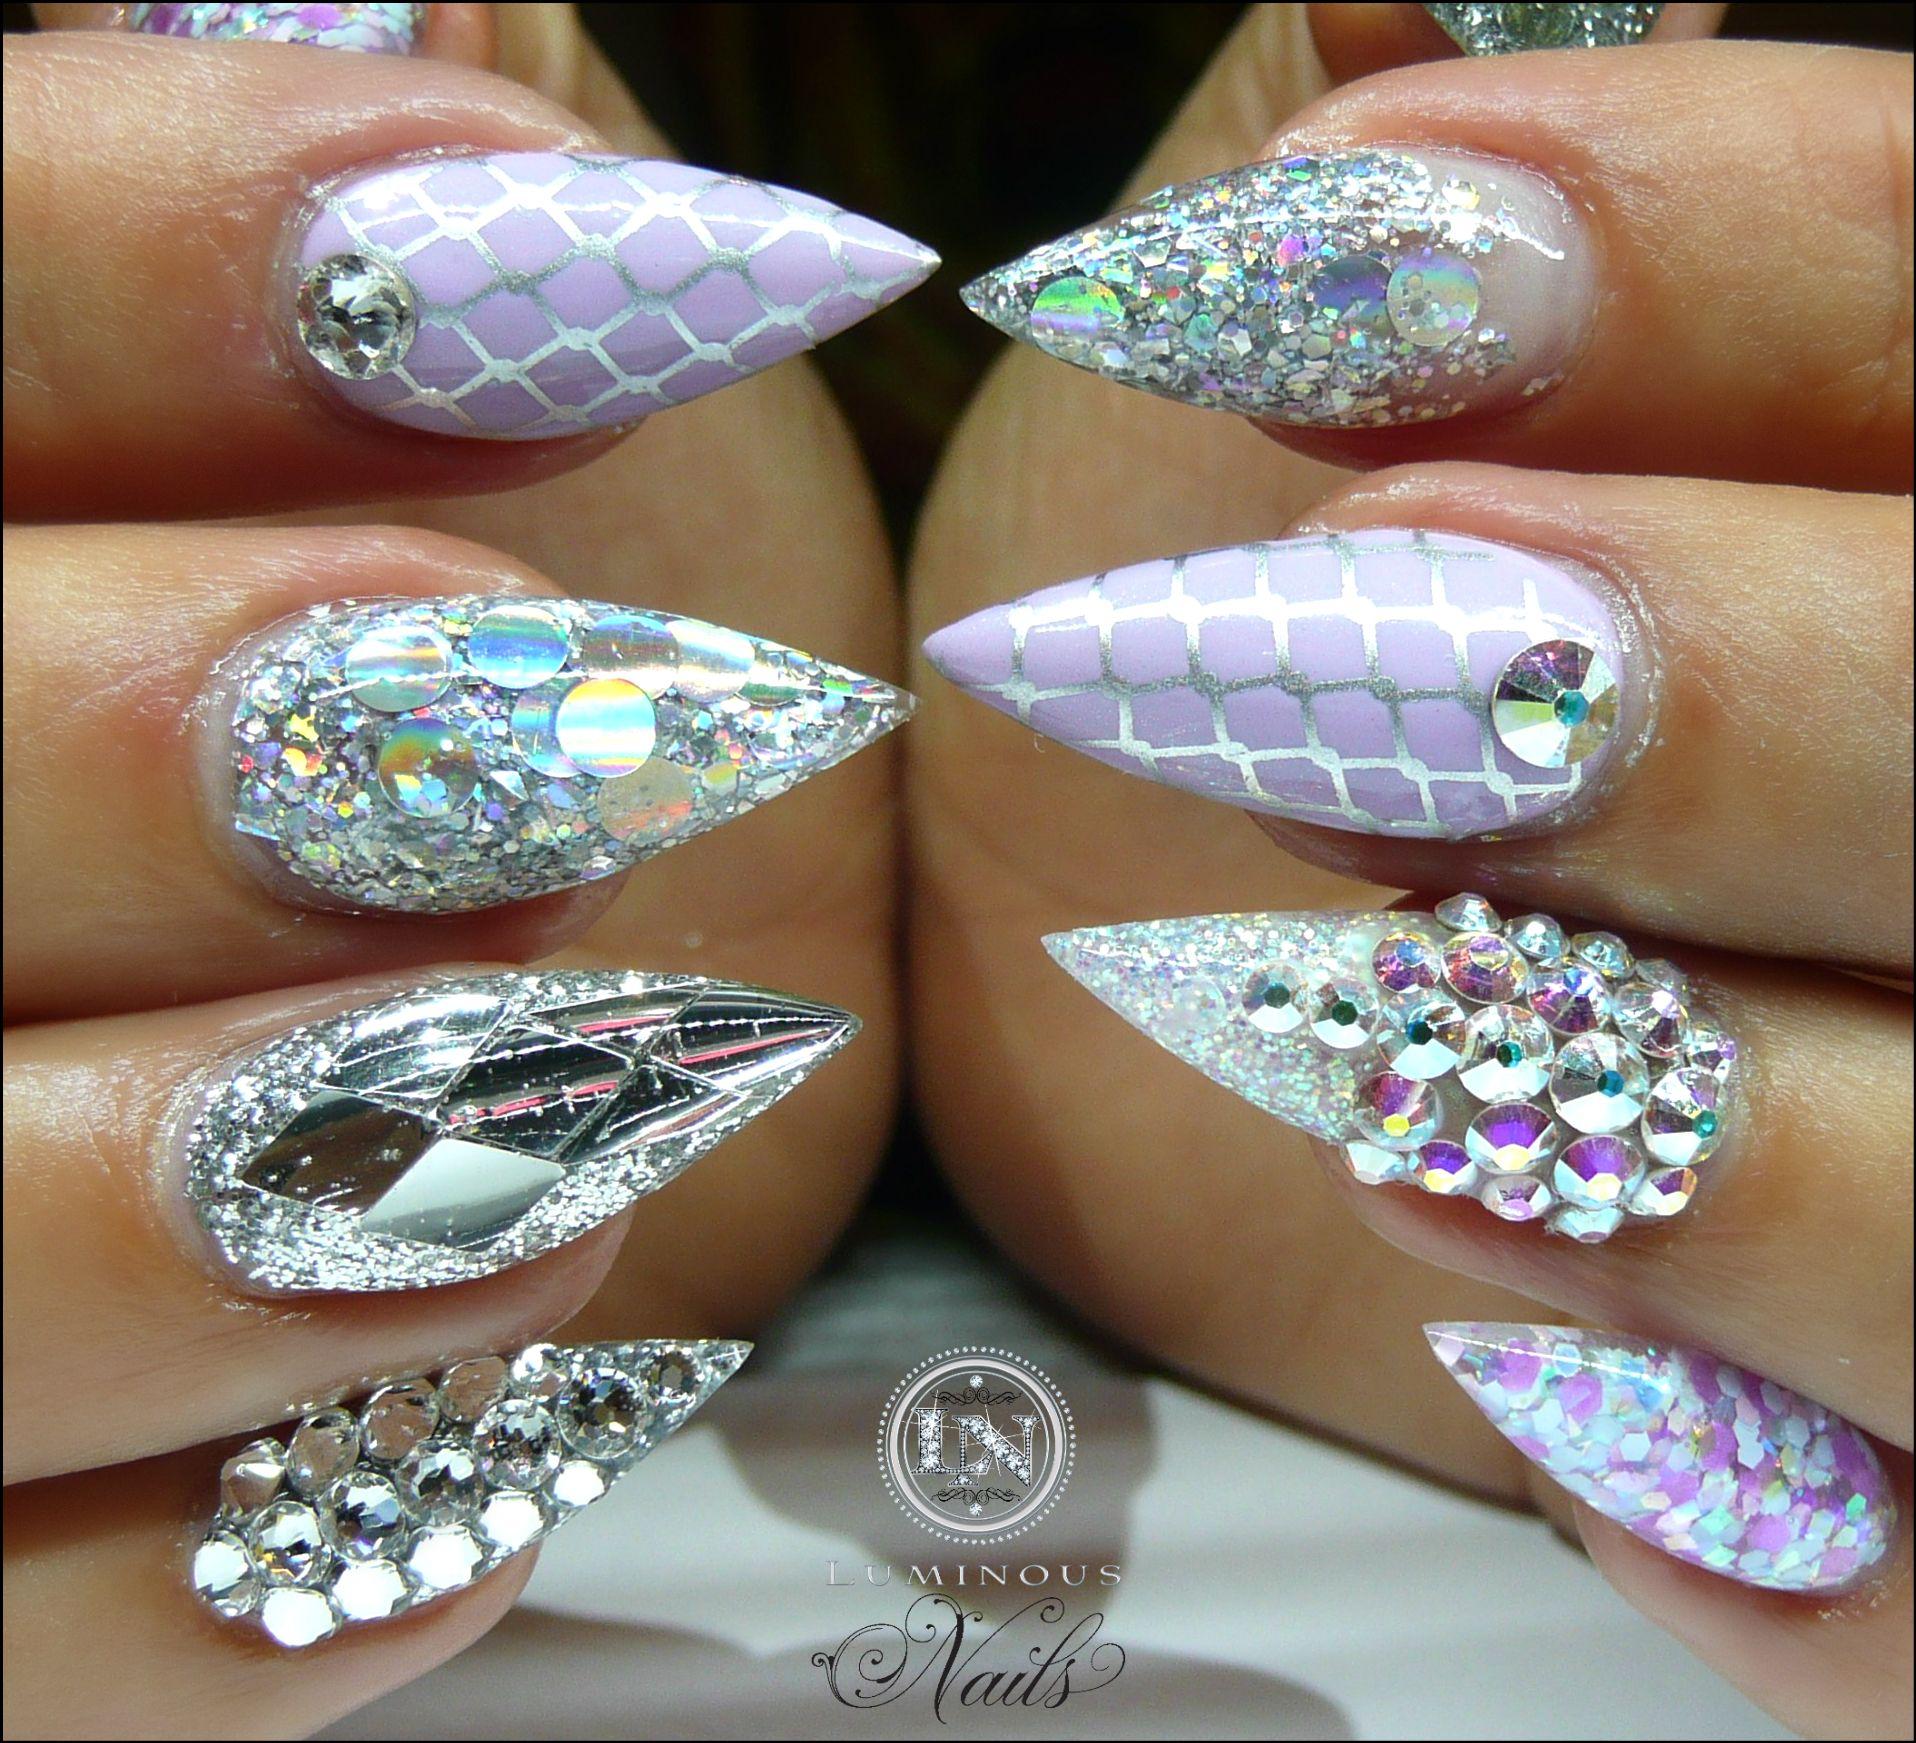 luminous-nails-beauty-gold-coast-qld.-silver-lilac-nails.-acrylic ...